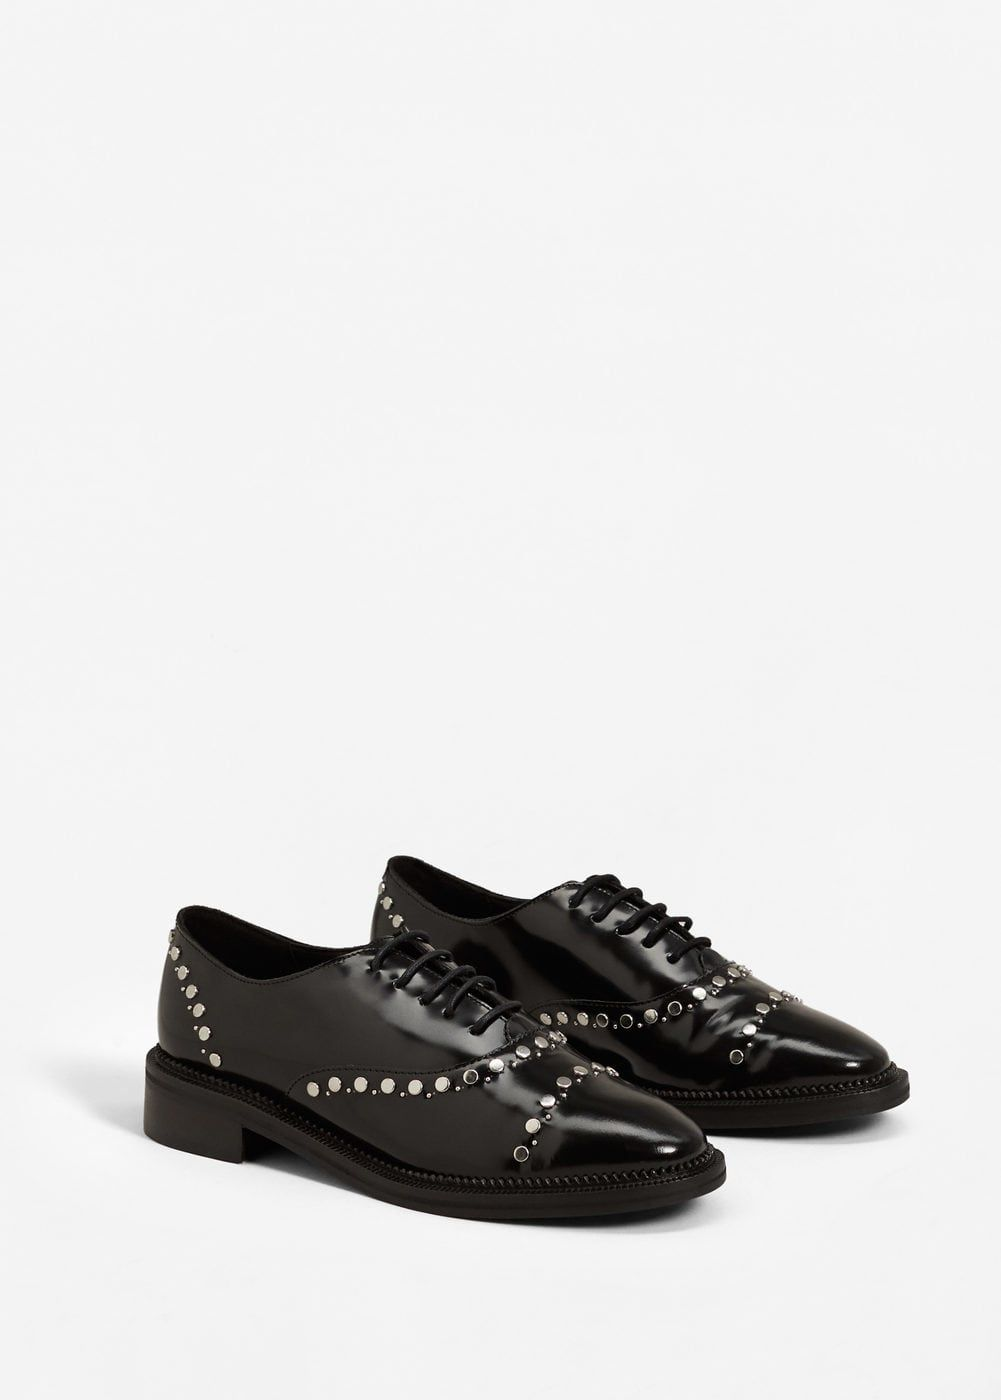 db386fcd8 Skórzane buty z ćwiekami - Kobieta | MANGO Polska Sapatos Rasos, Mulher,  Sapatos Caros. Ler